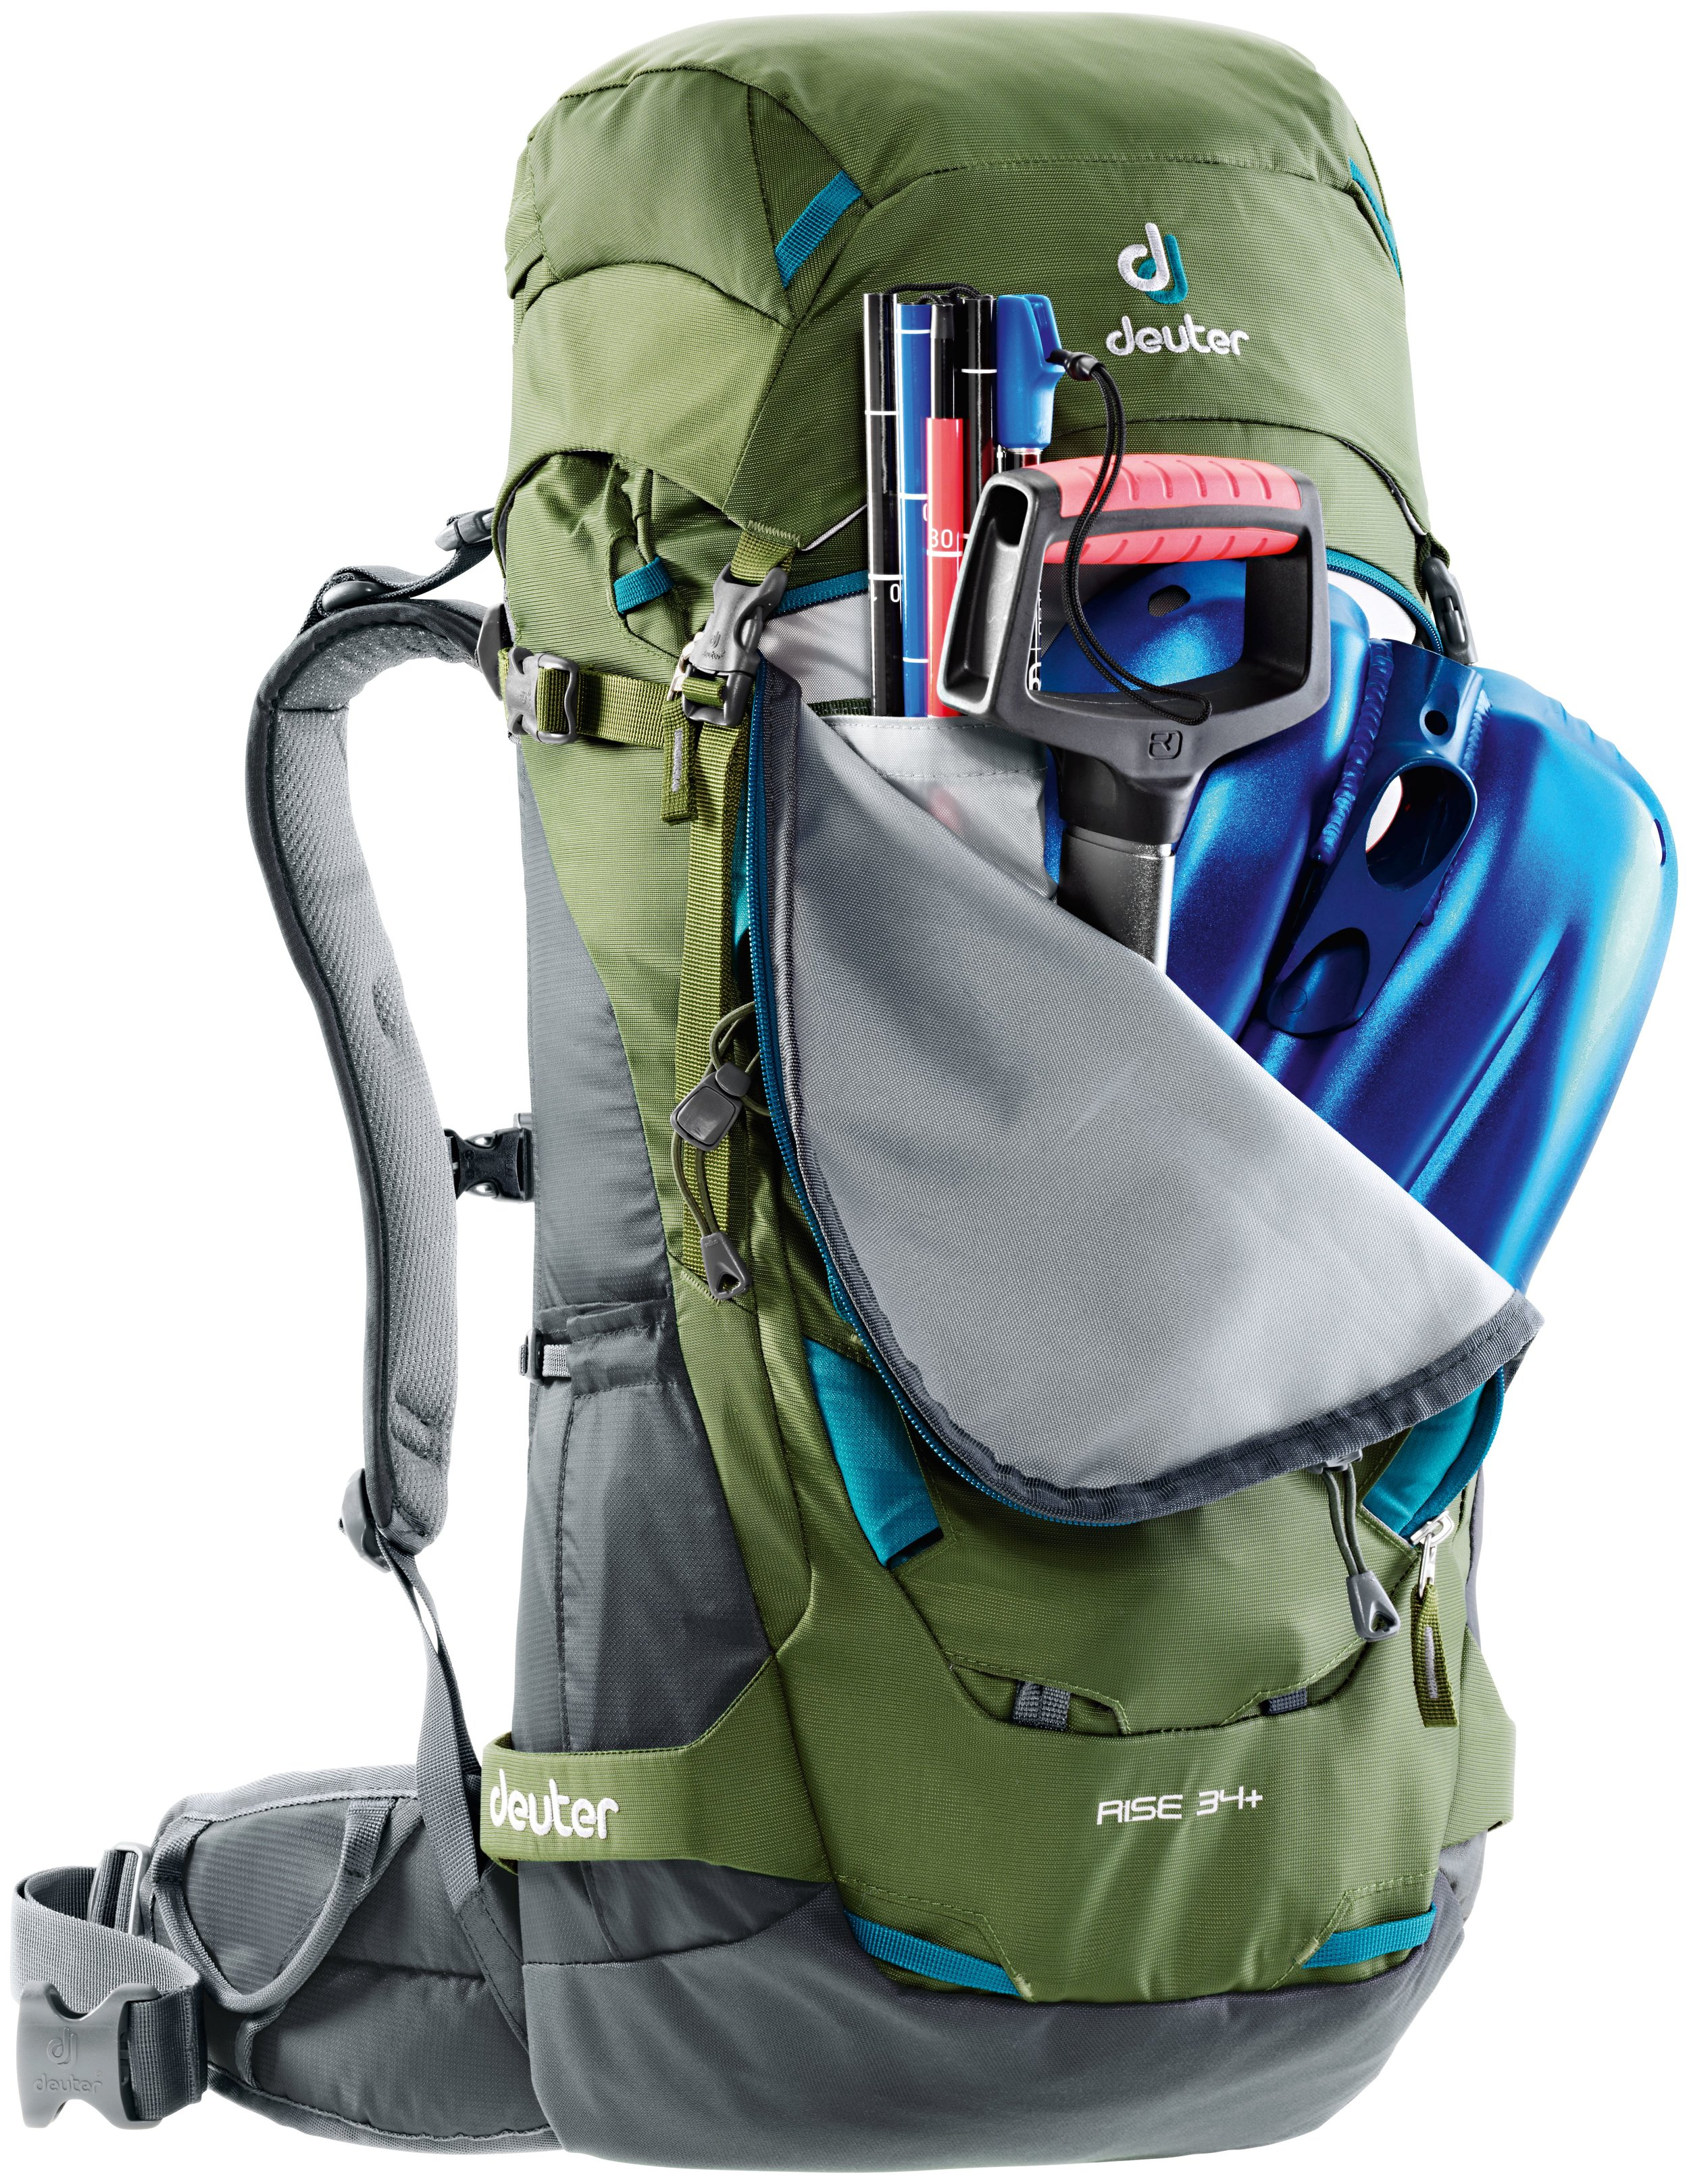 Rise34plus-2480-Safety Pocket.jpg